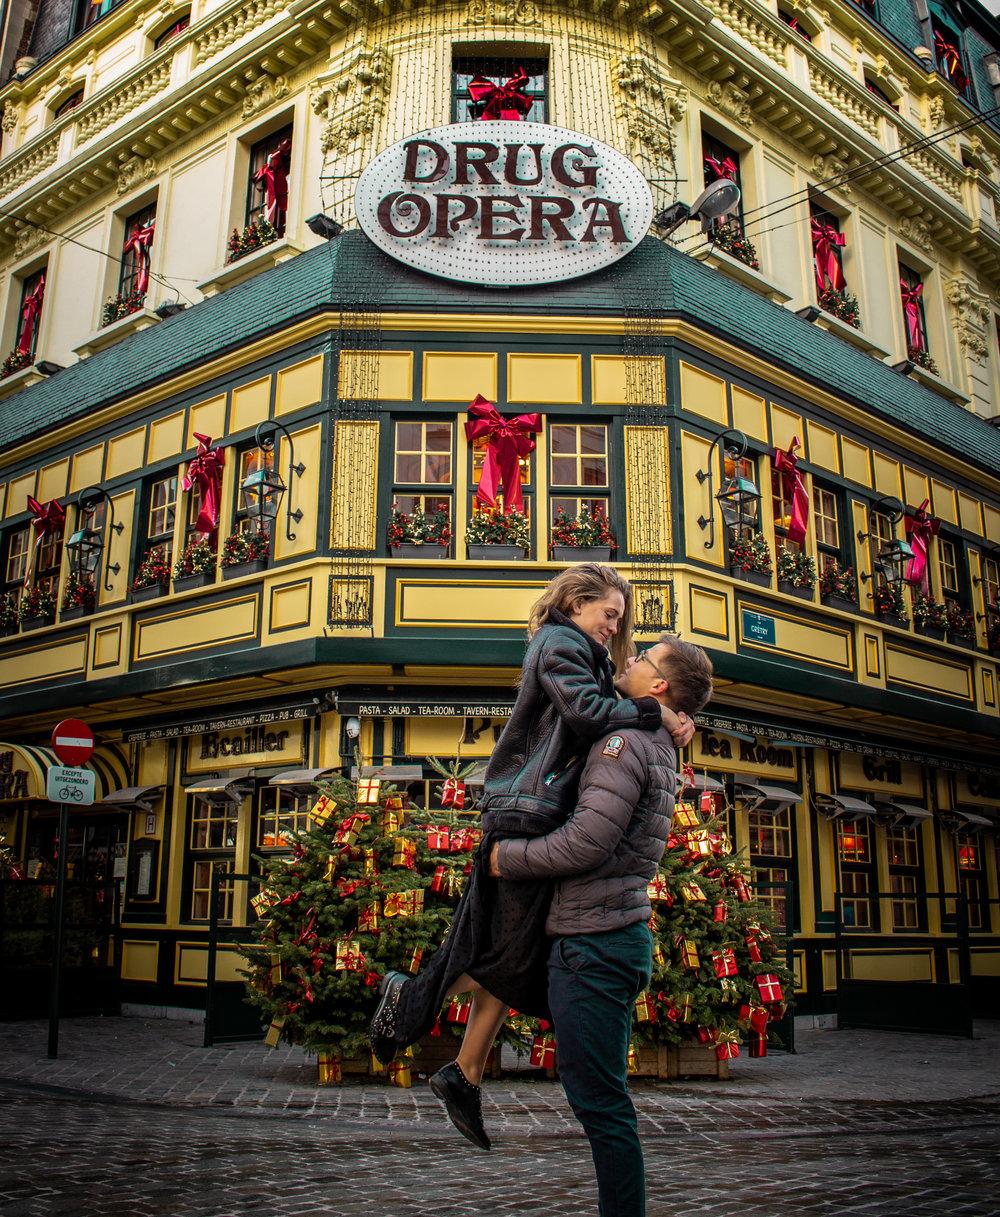 Bruxelles drug opera